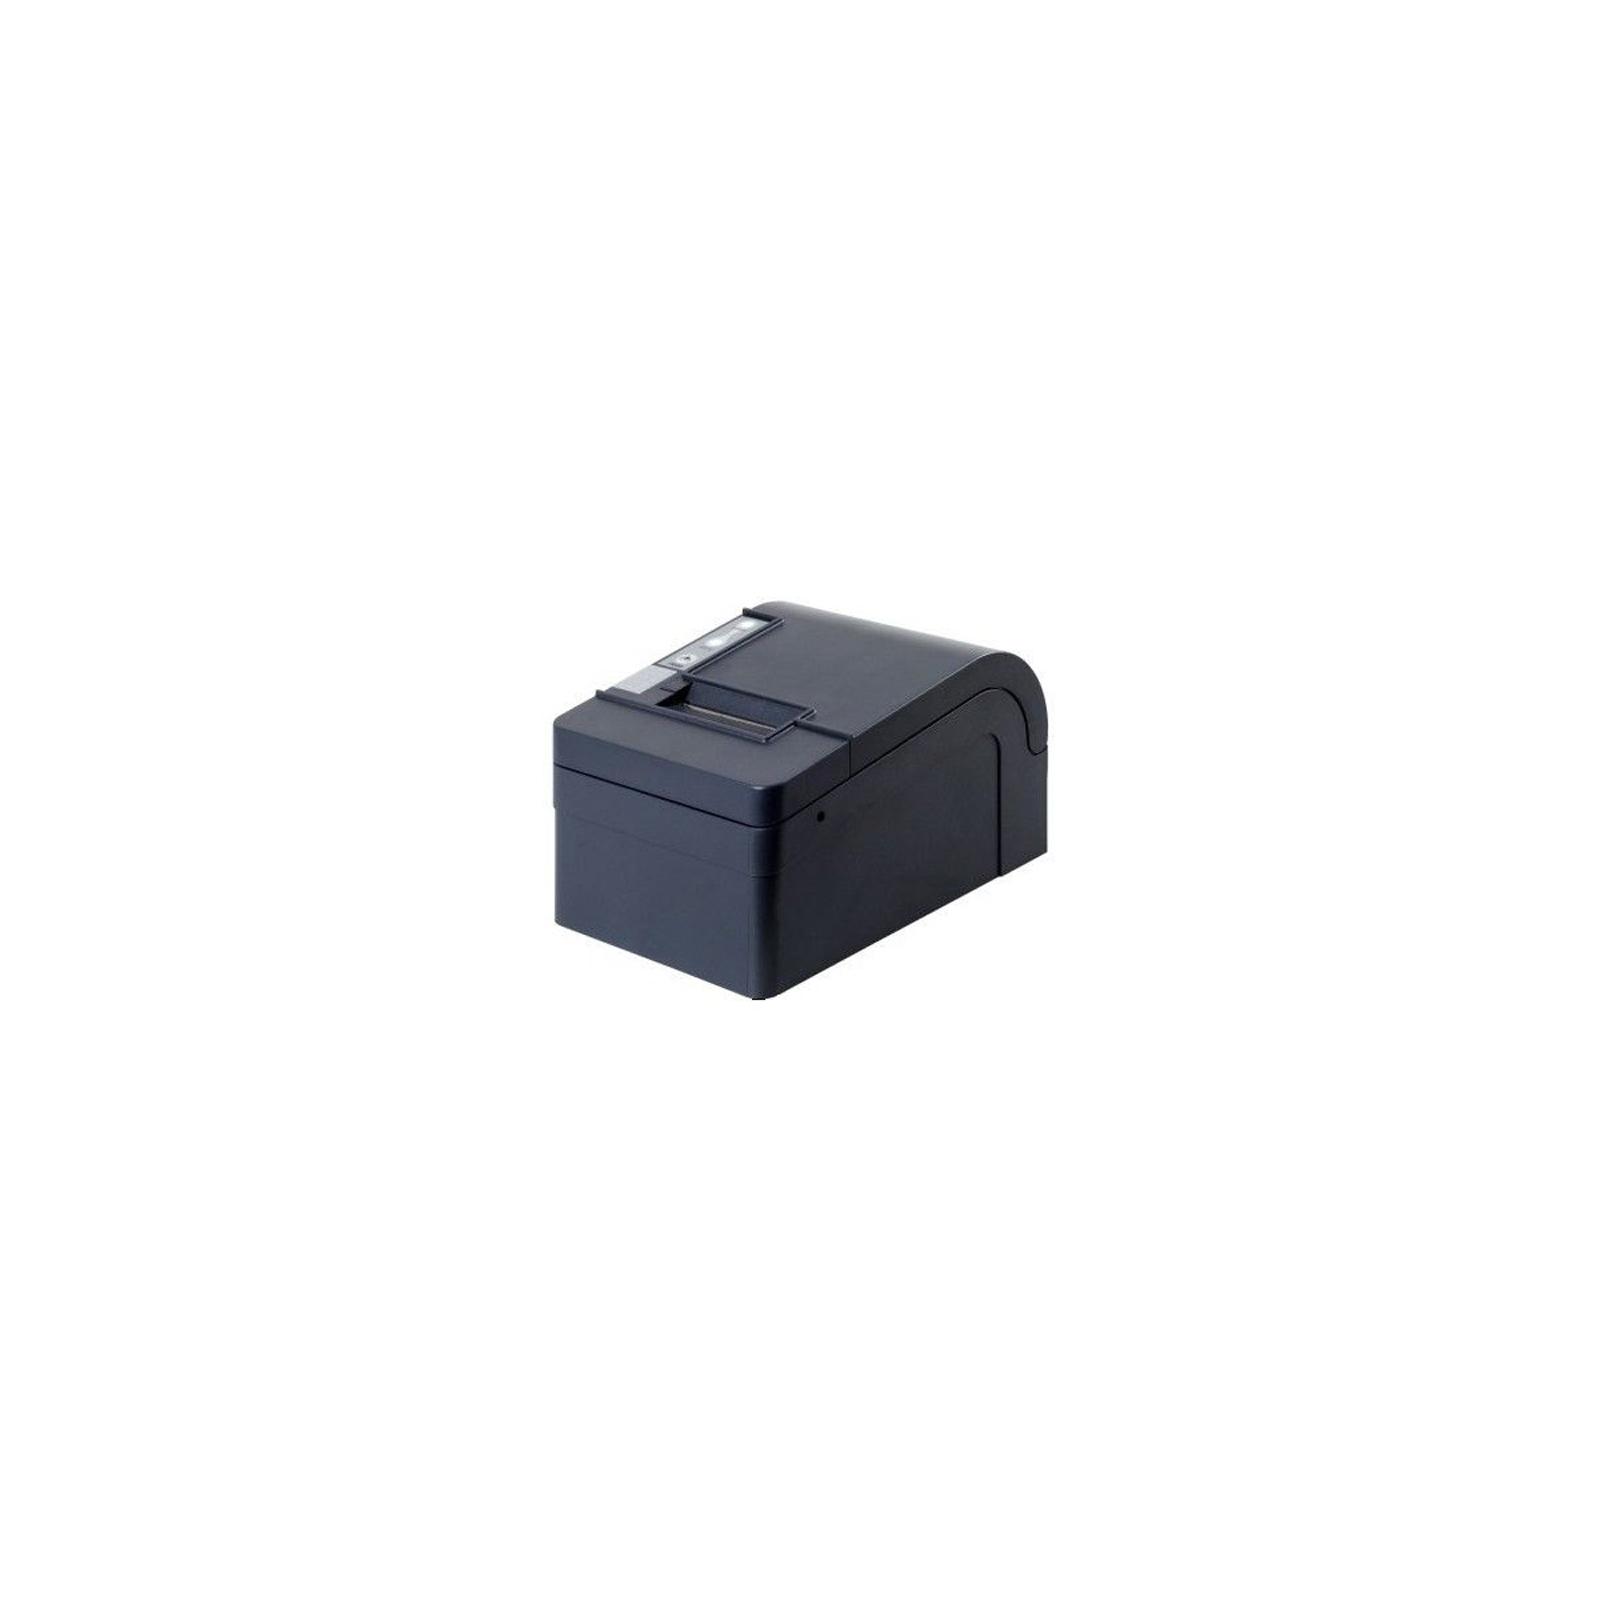 Принтер чеков Syncotek POS 58 VC130 USB (000001999)